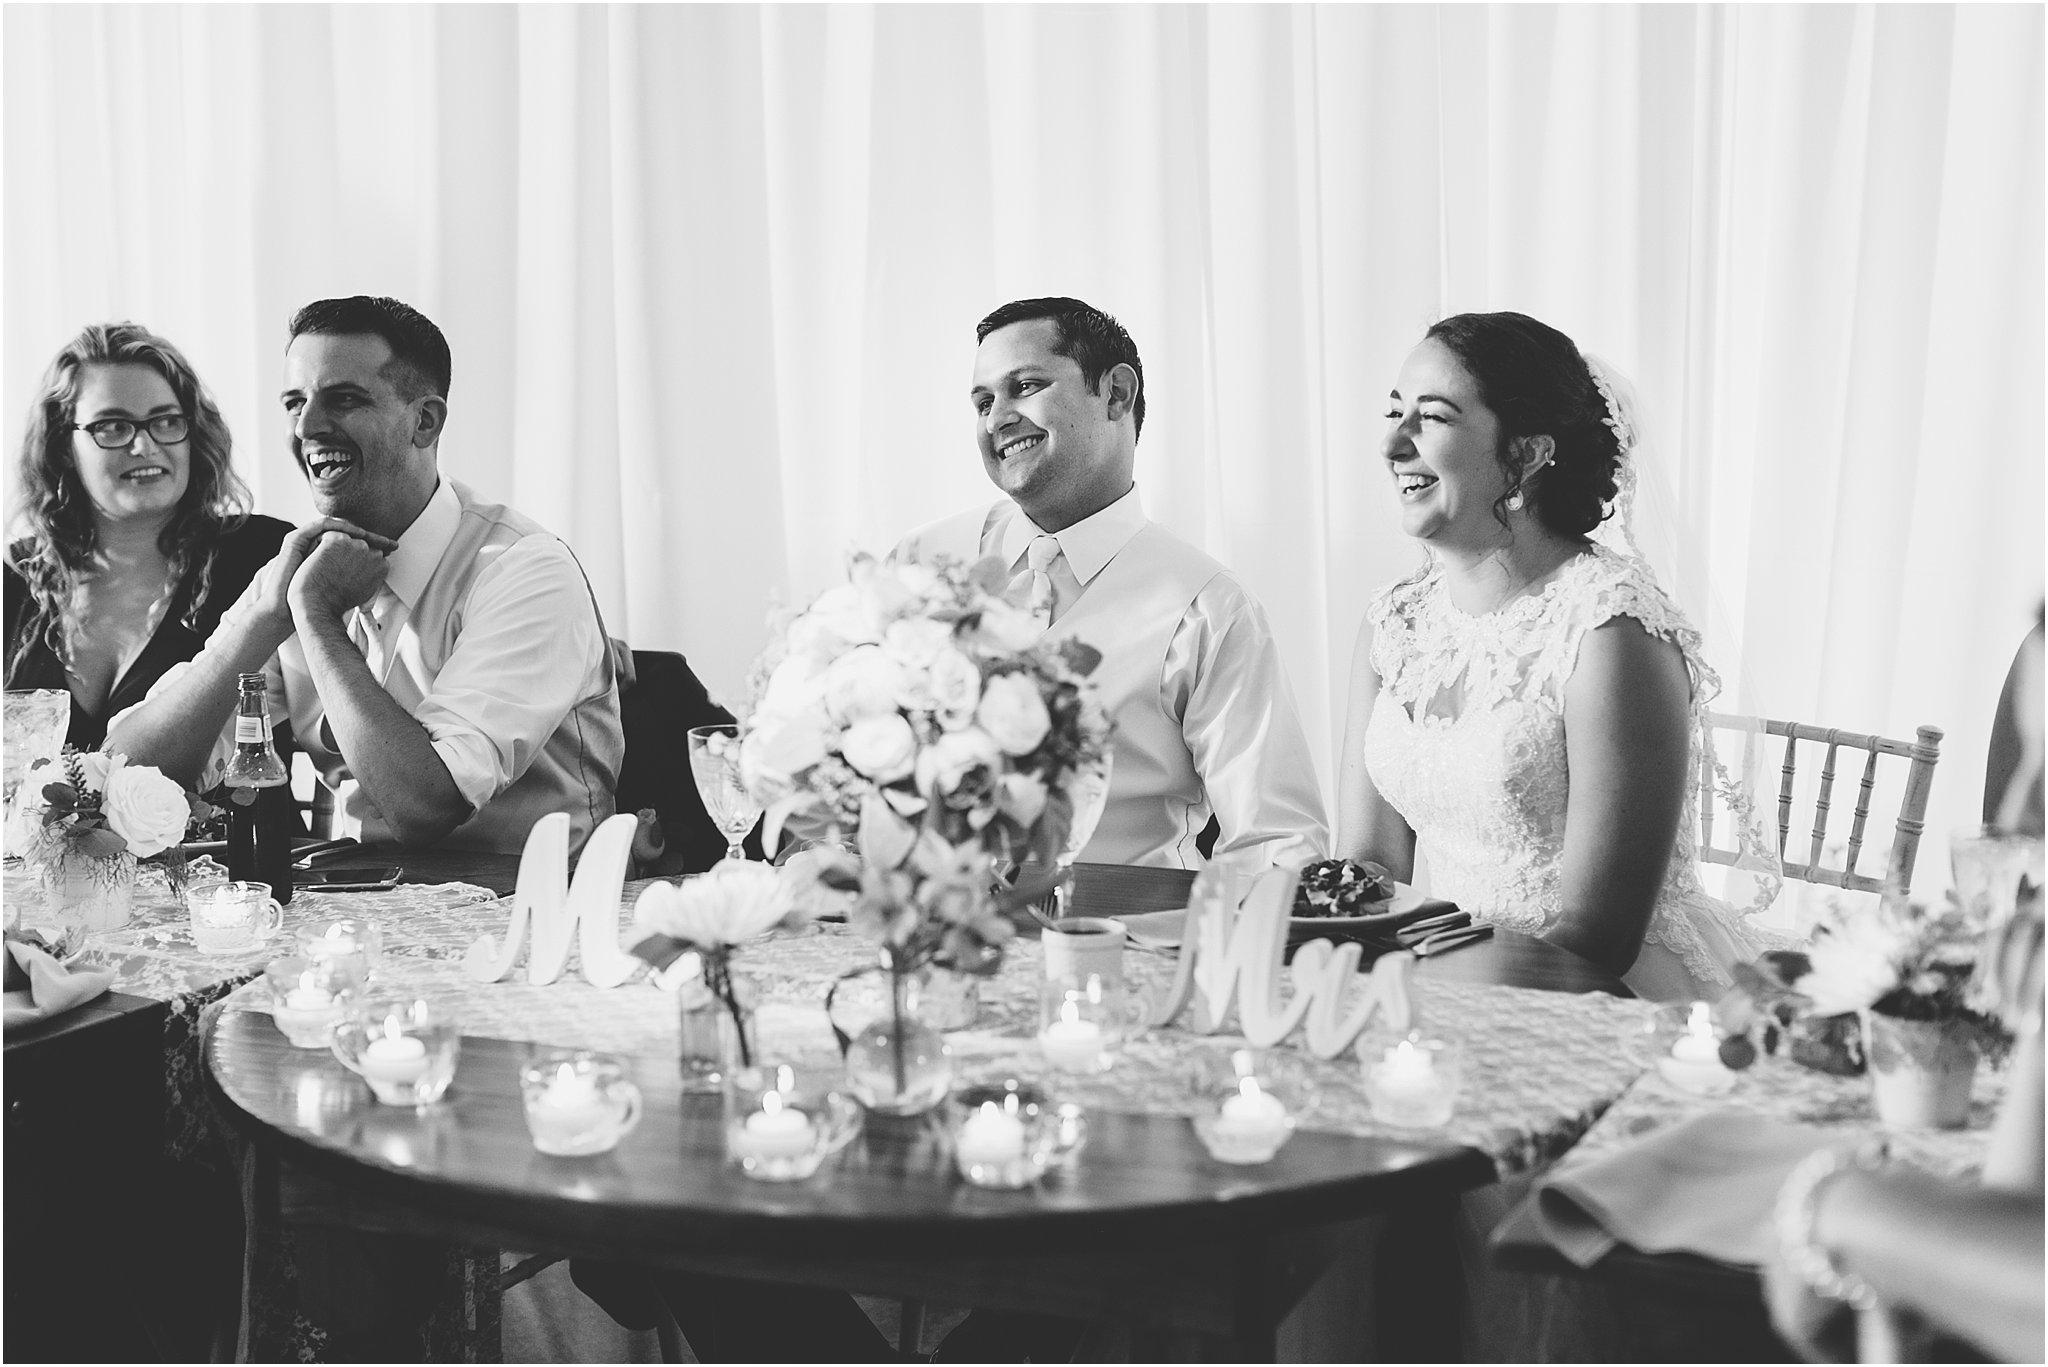 jessica_ryan_photography_virginia_wedding_photographer_wedding_hurricane_norfolk_botanical_gardens_hurricane_matthew_wedding_3635